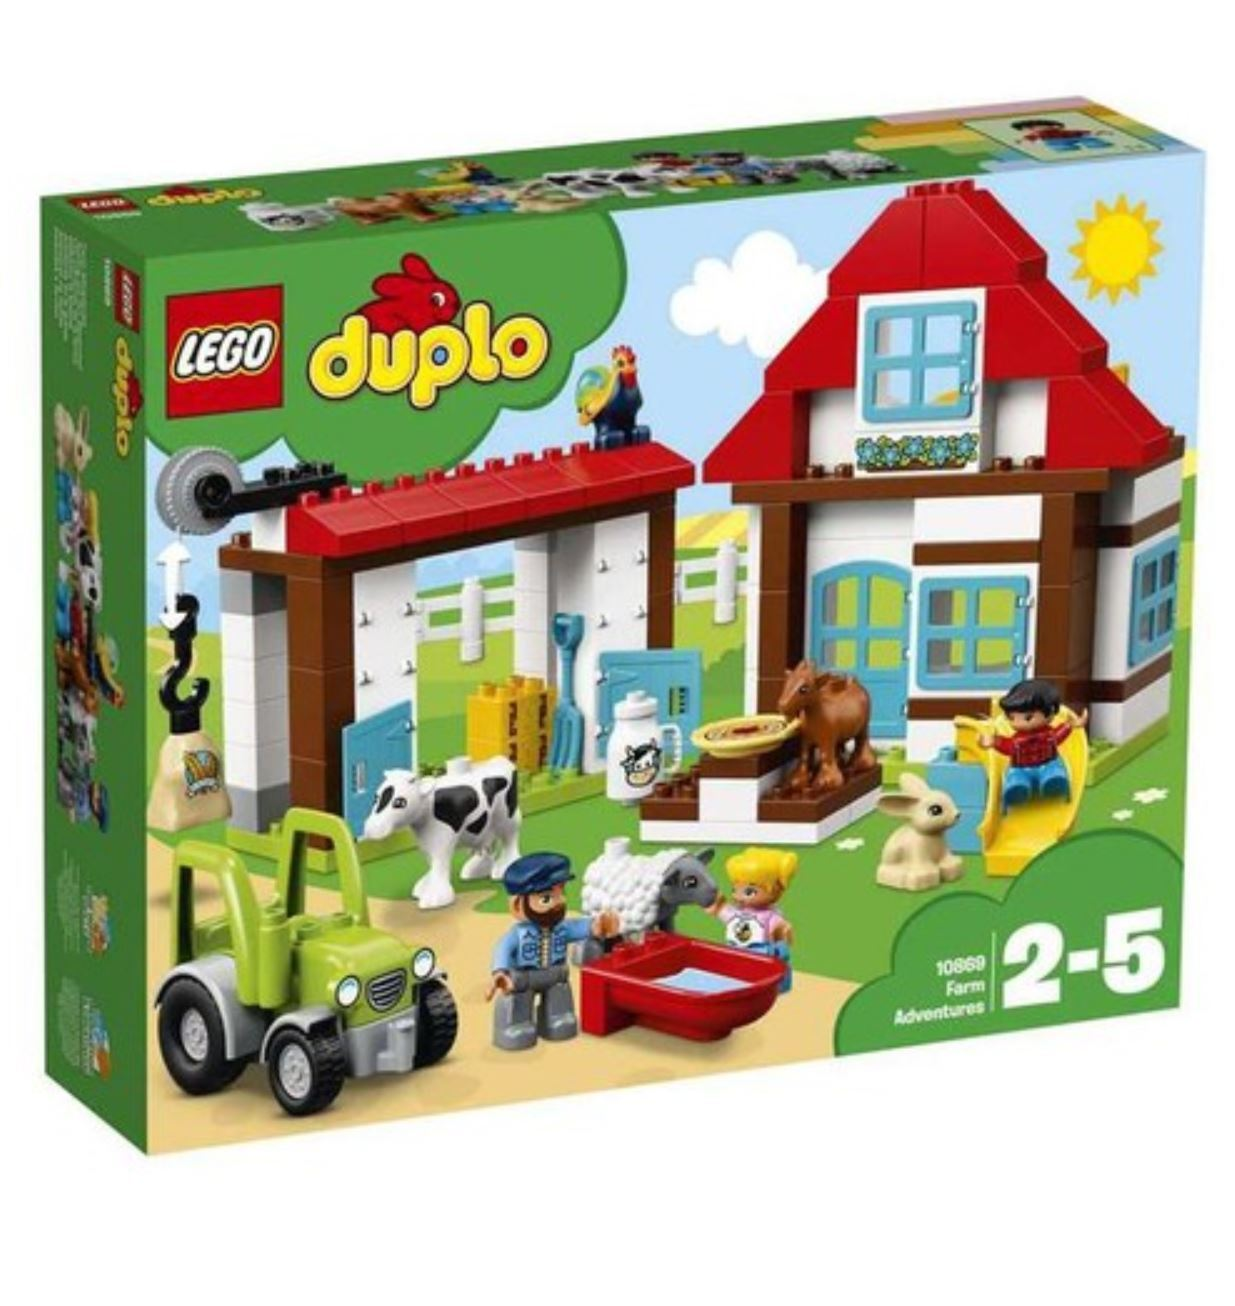 Duplo 10869 Creative Play Farm Farm Farm Adventures 2018 Version Free Shipping ae3dd7